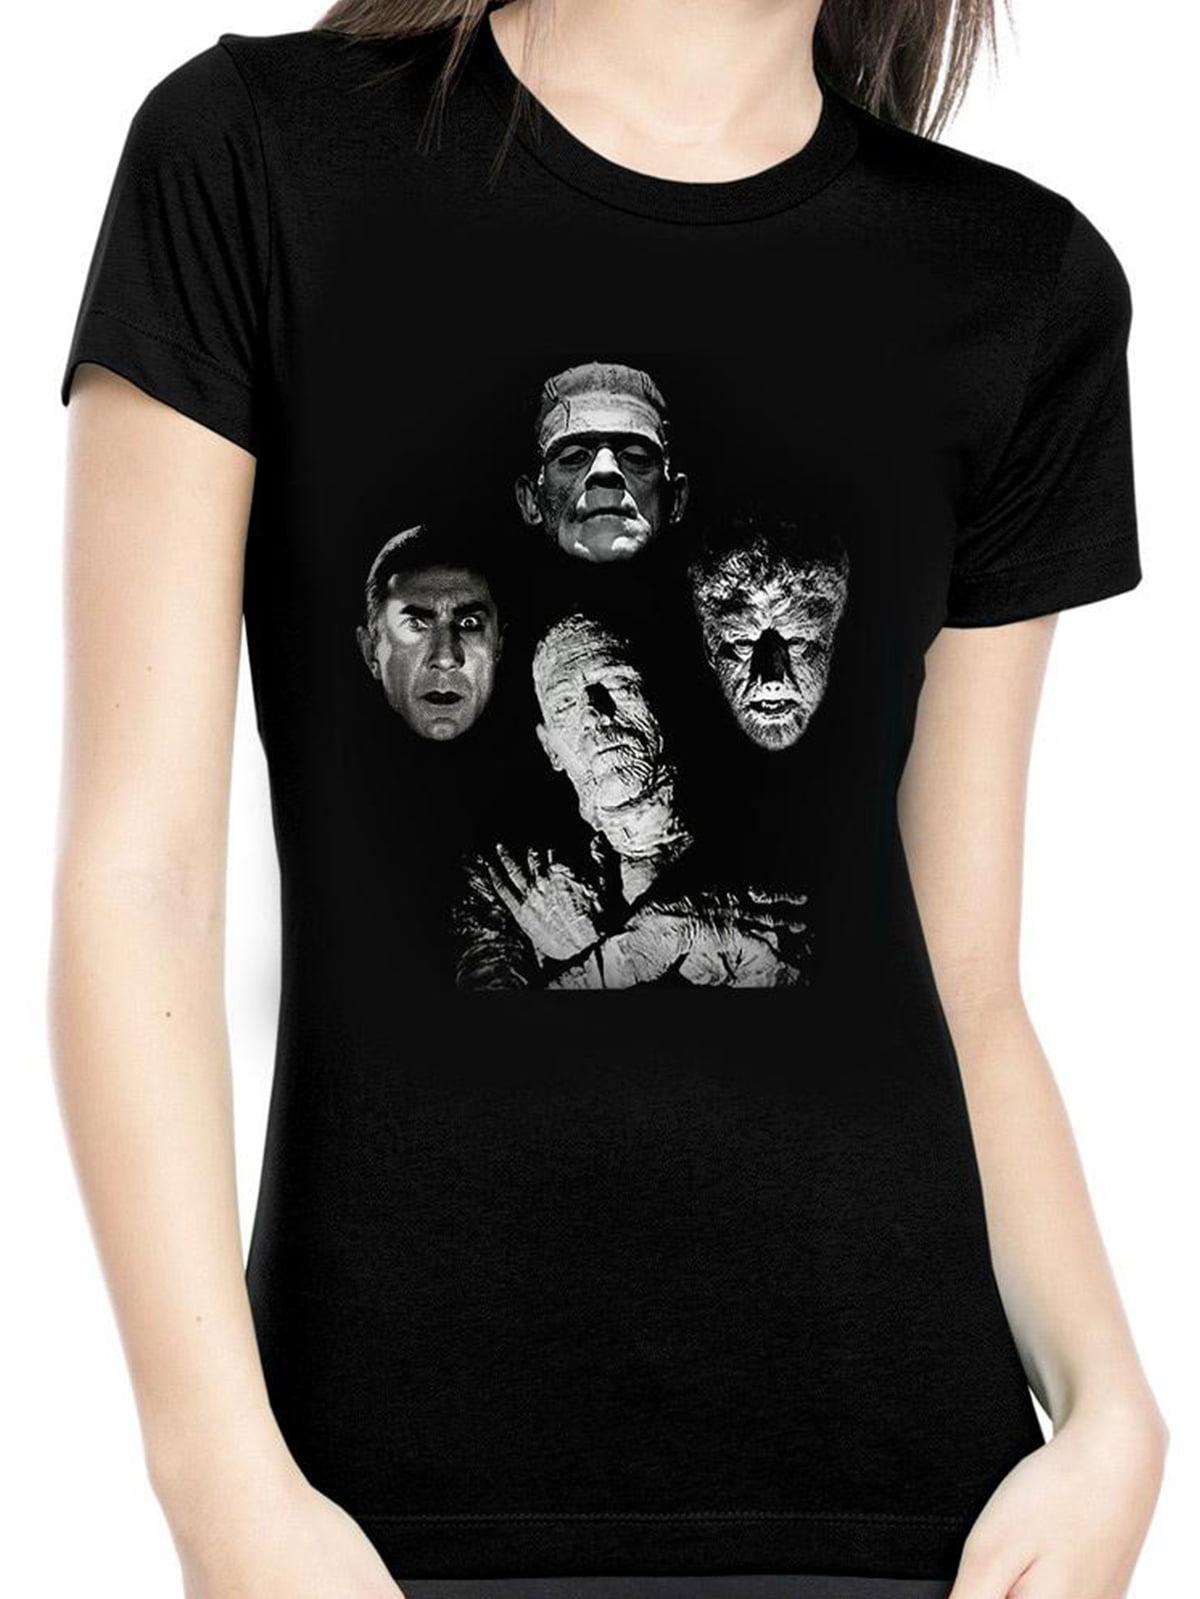 Rock Rebel Womens Warhol Bride of Frankenstein Black T Shirt